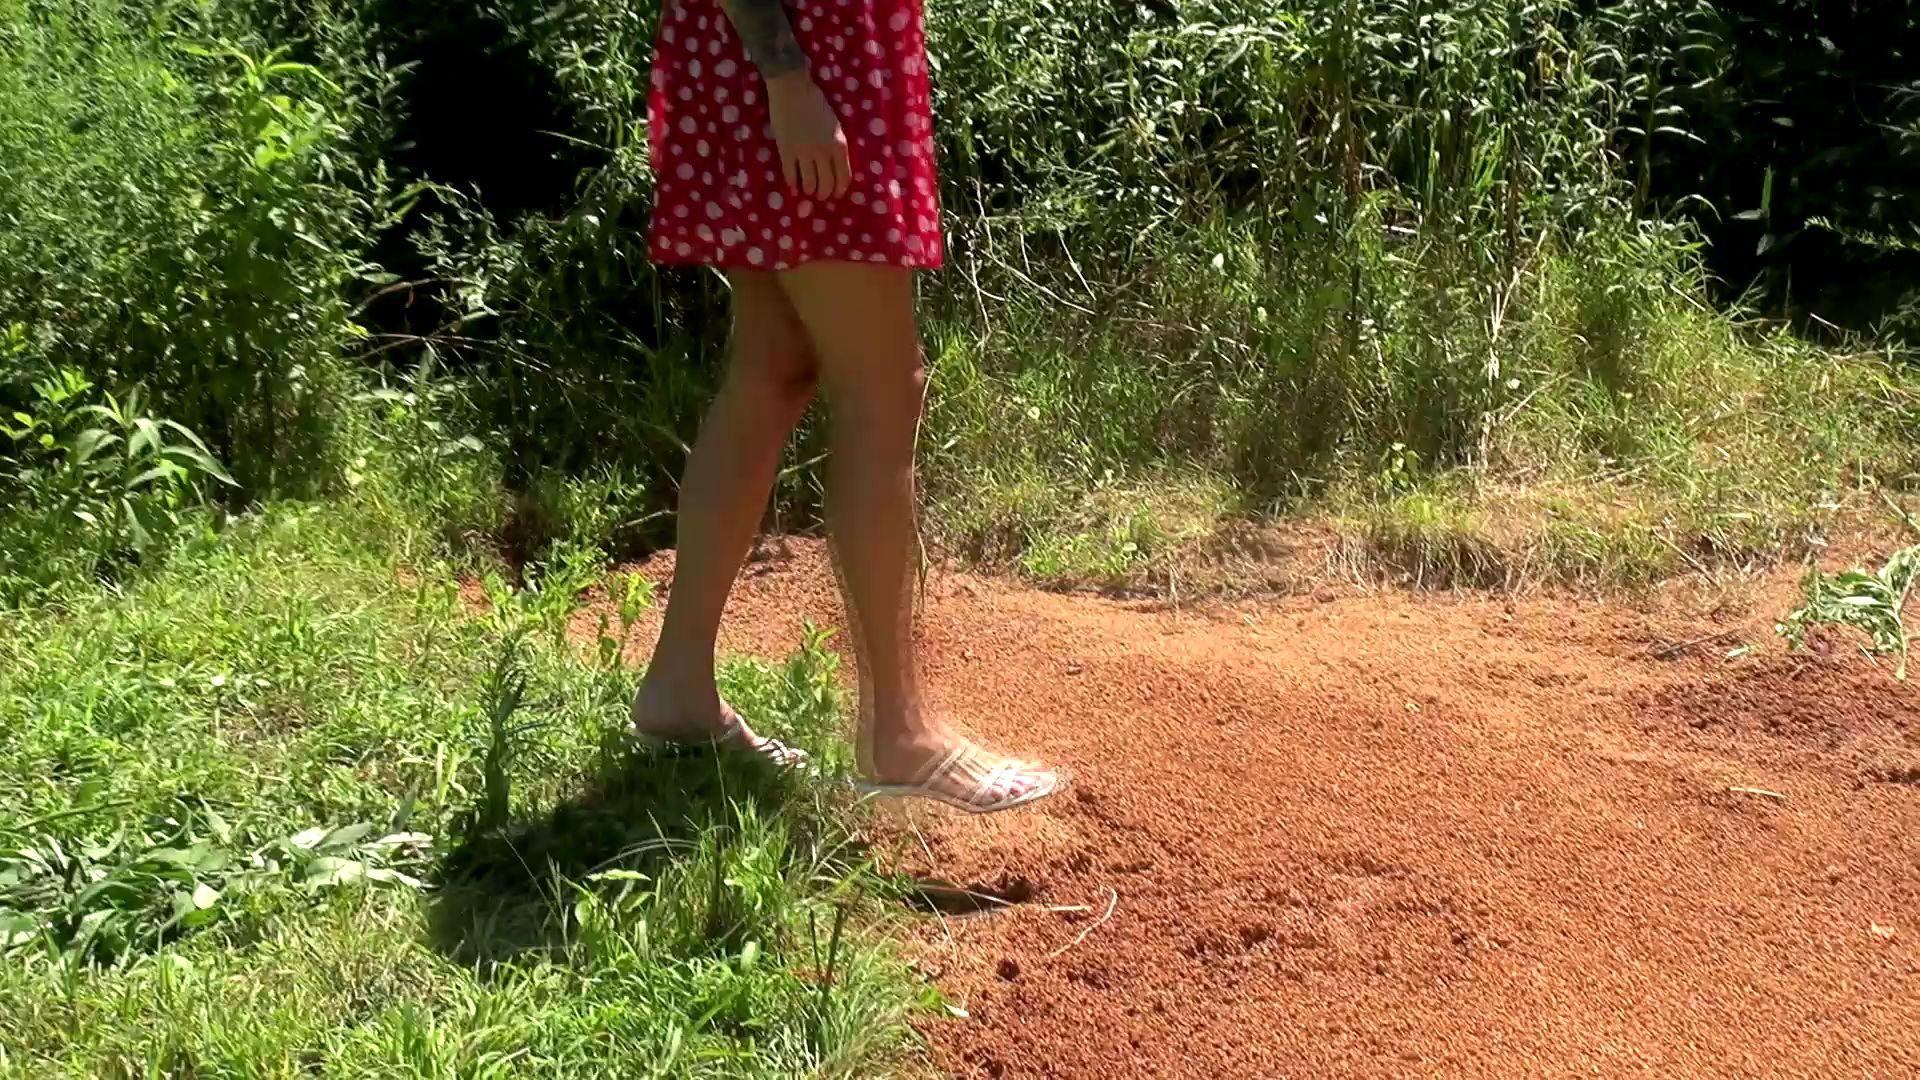 Gummi Big Boobs Quicksand Gummi-in-hollywood-quicksand_12